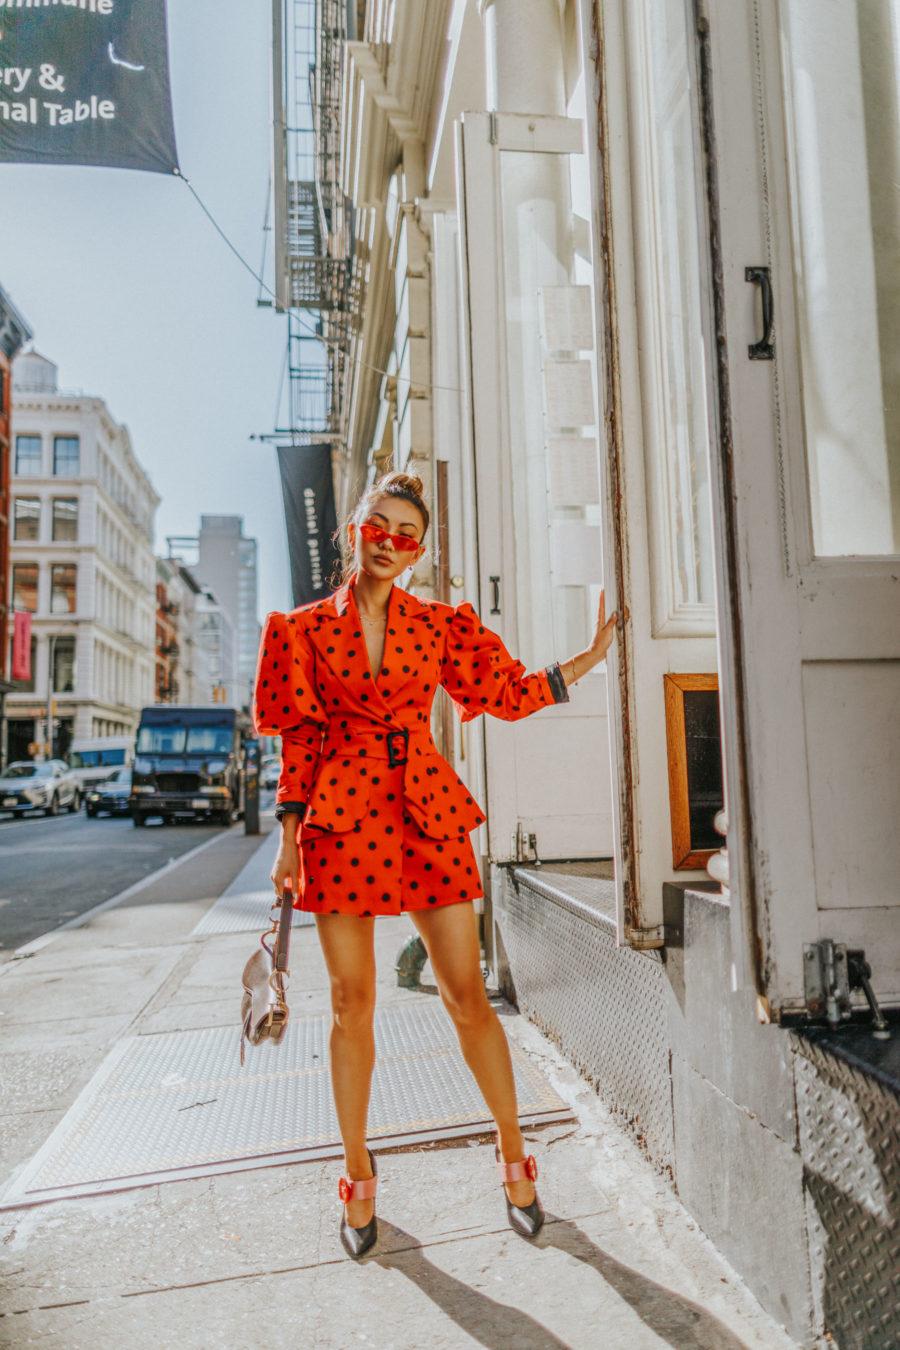 jessica wang wearing a polka dot blazer and matching skirt // Jessica Wang - Notjessfashion.com